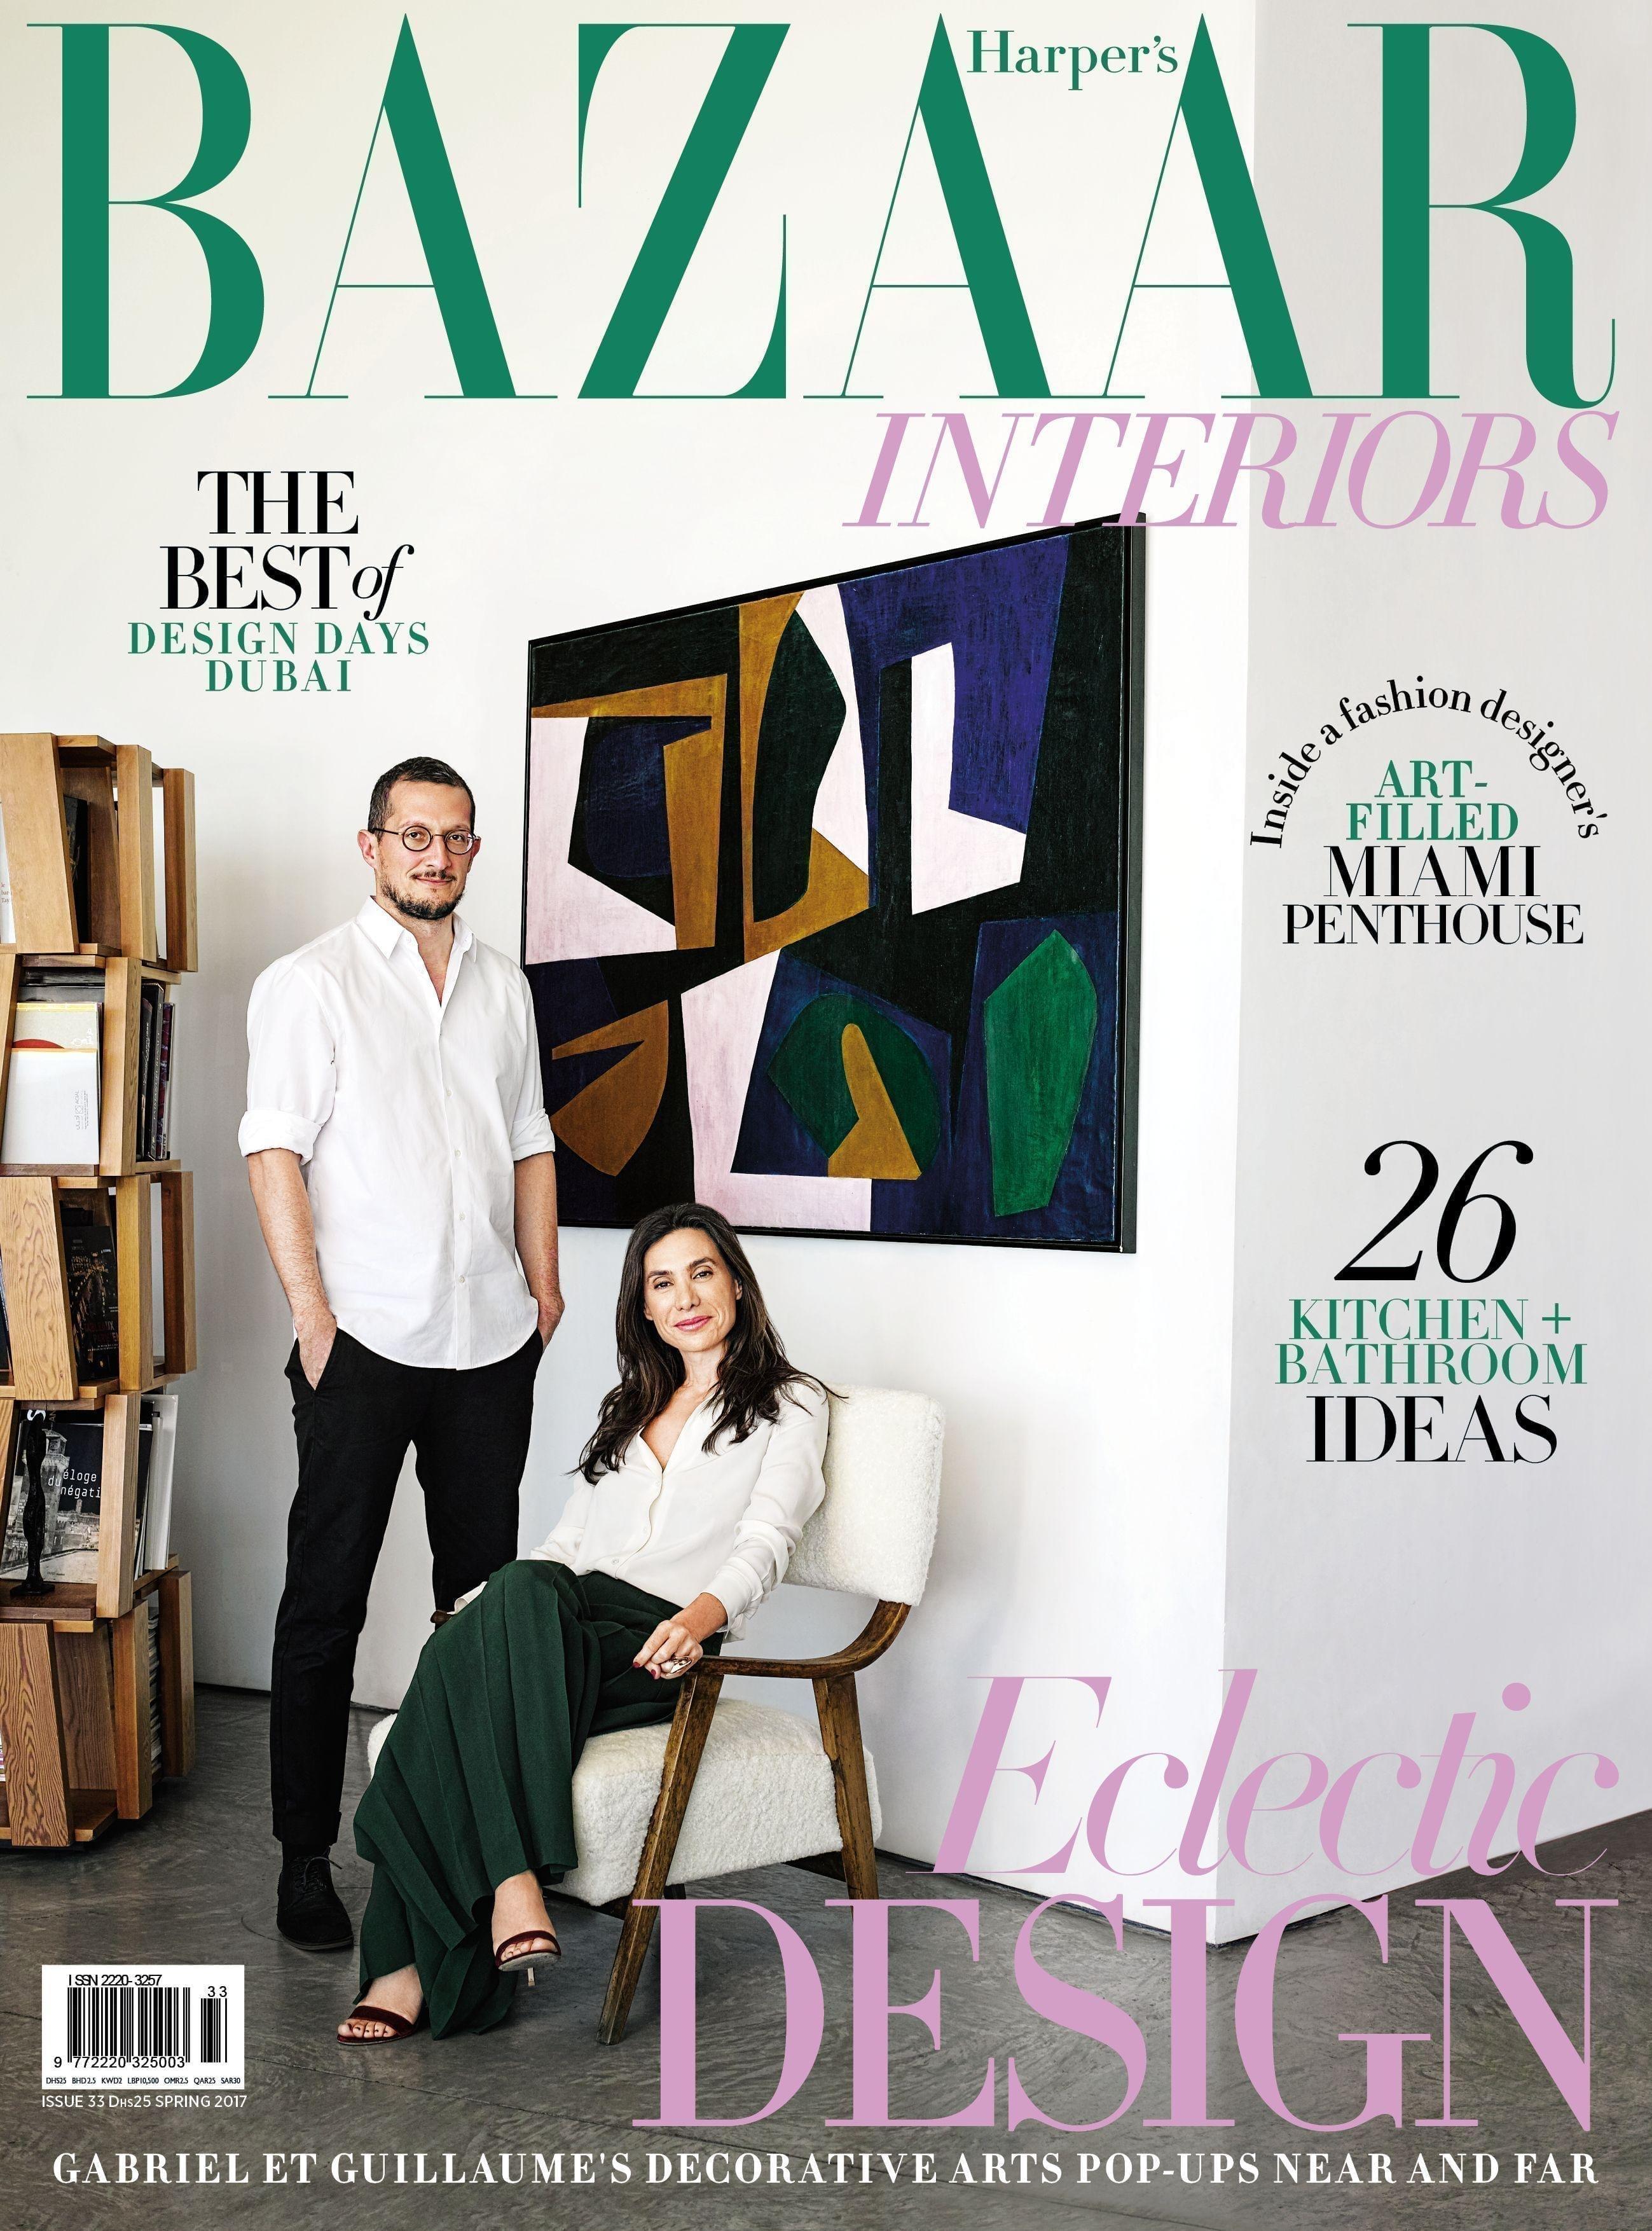 Most known interior design magazines- harpers bazaar interiors